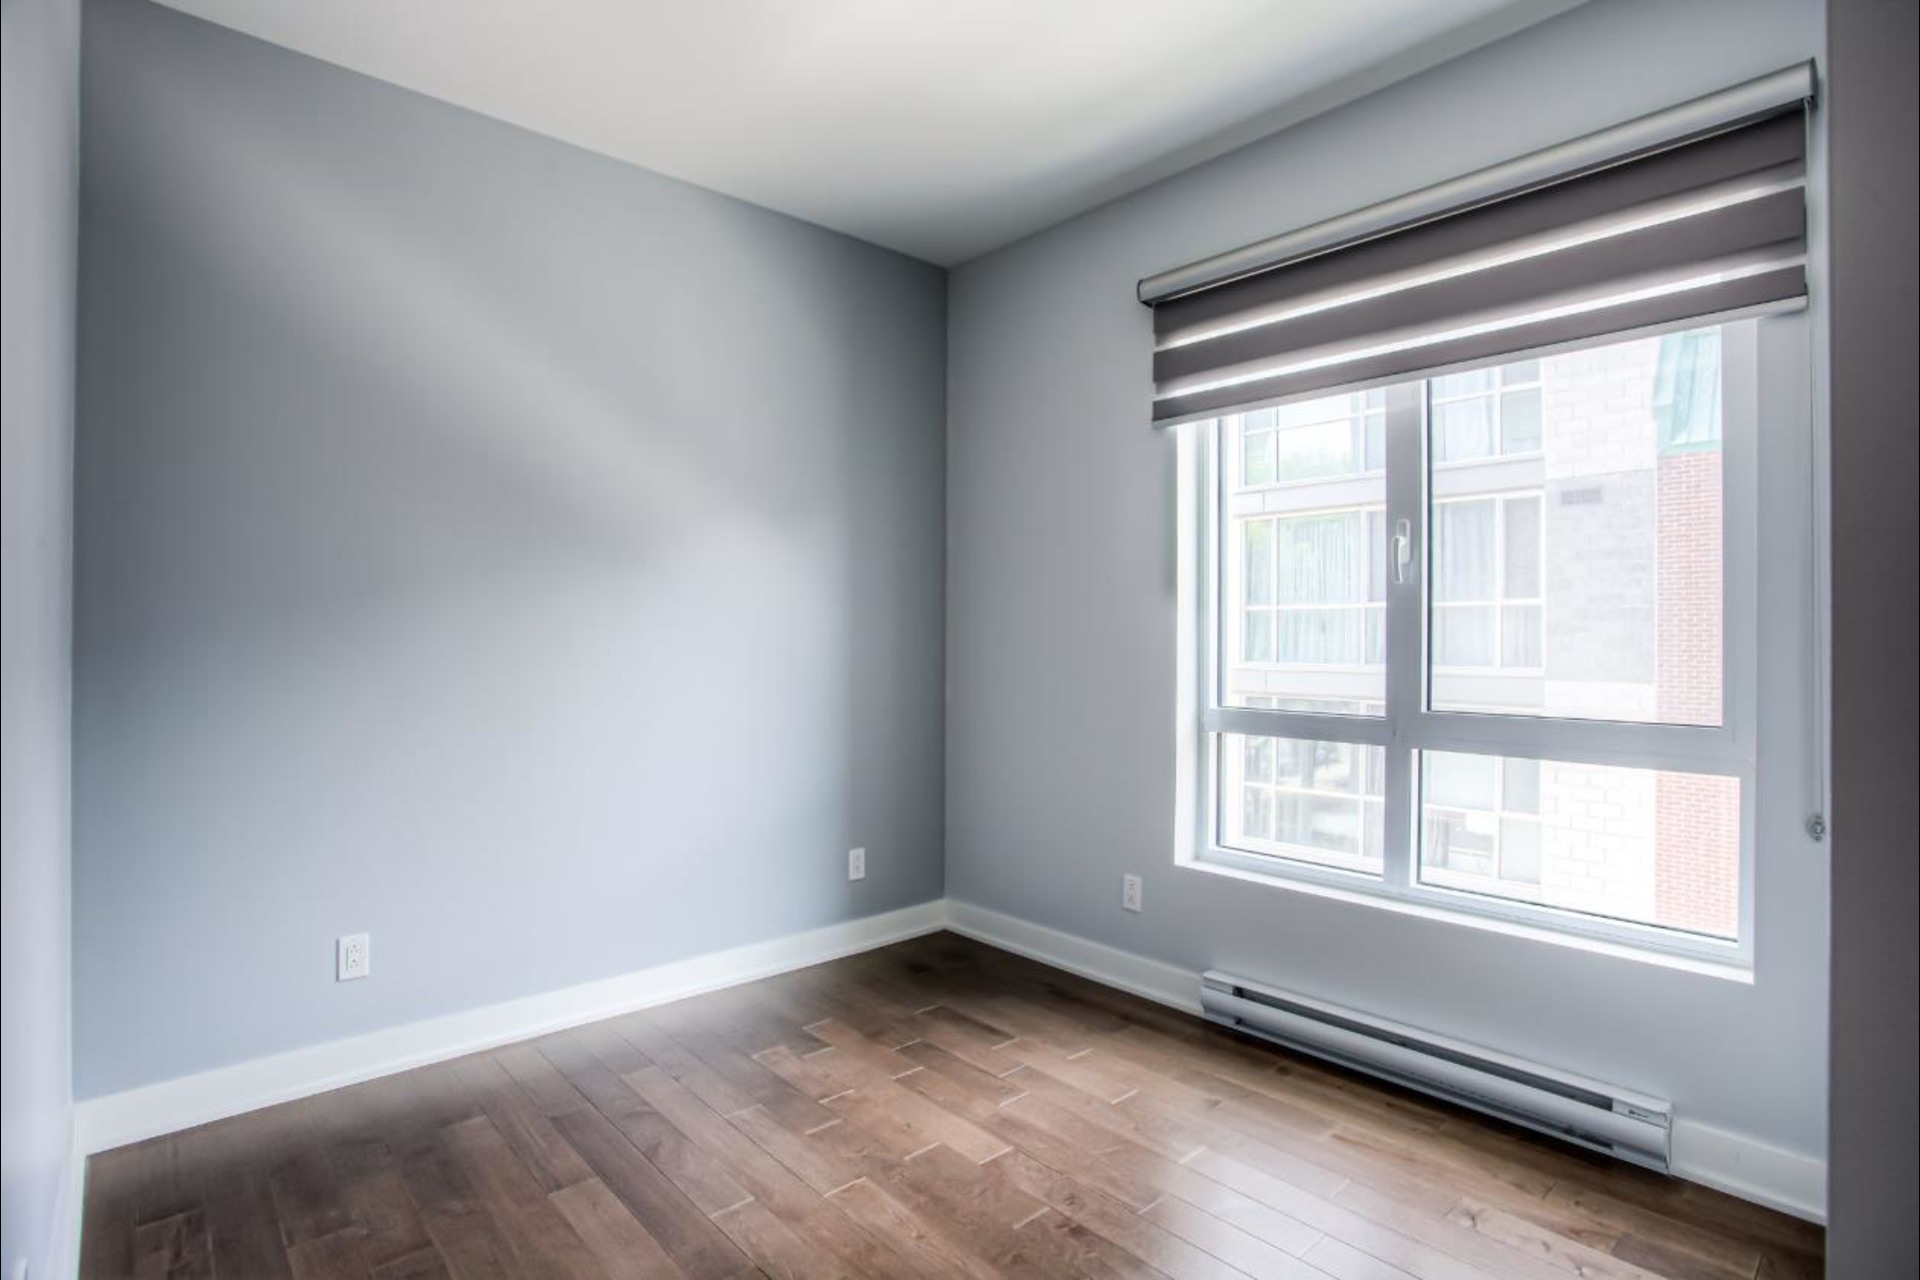 image 13 - 公寓 出租 Montréal - 6 室